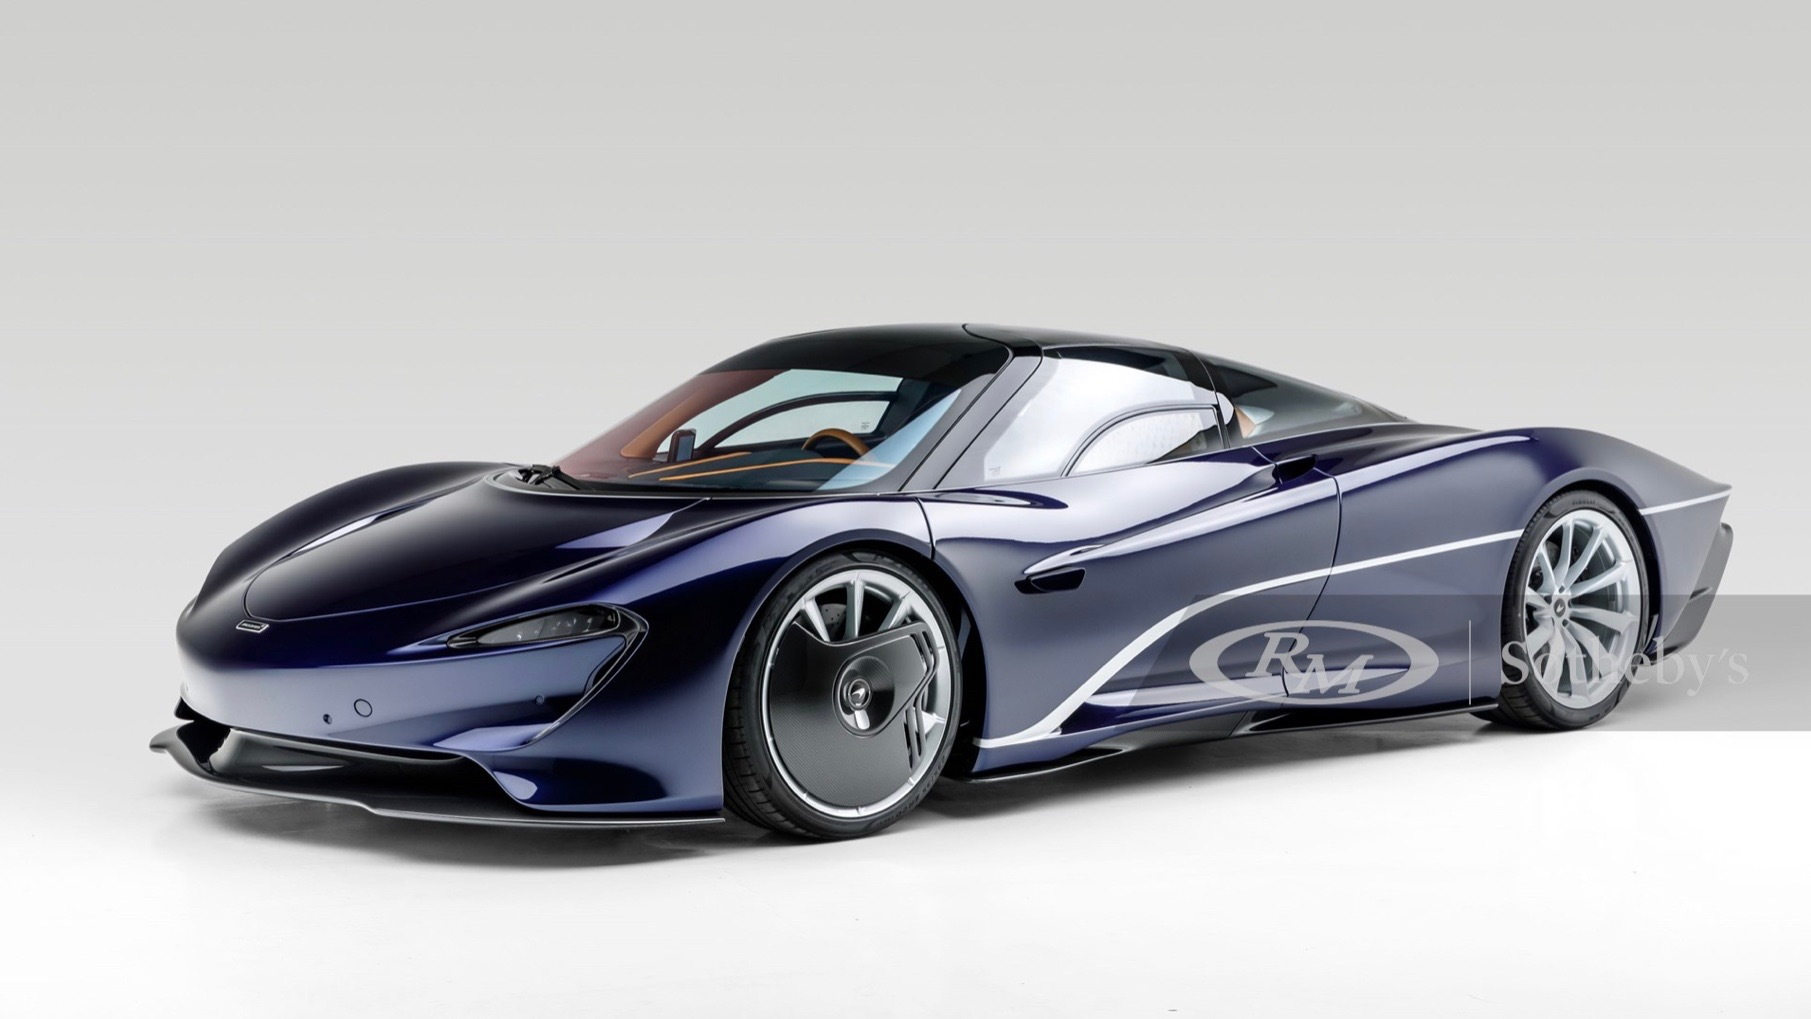 McLaren Speedtail number 36 (photo by RM Sotheby's)